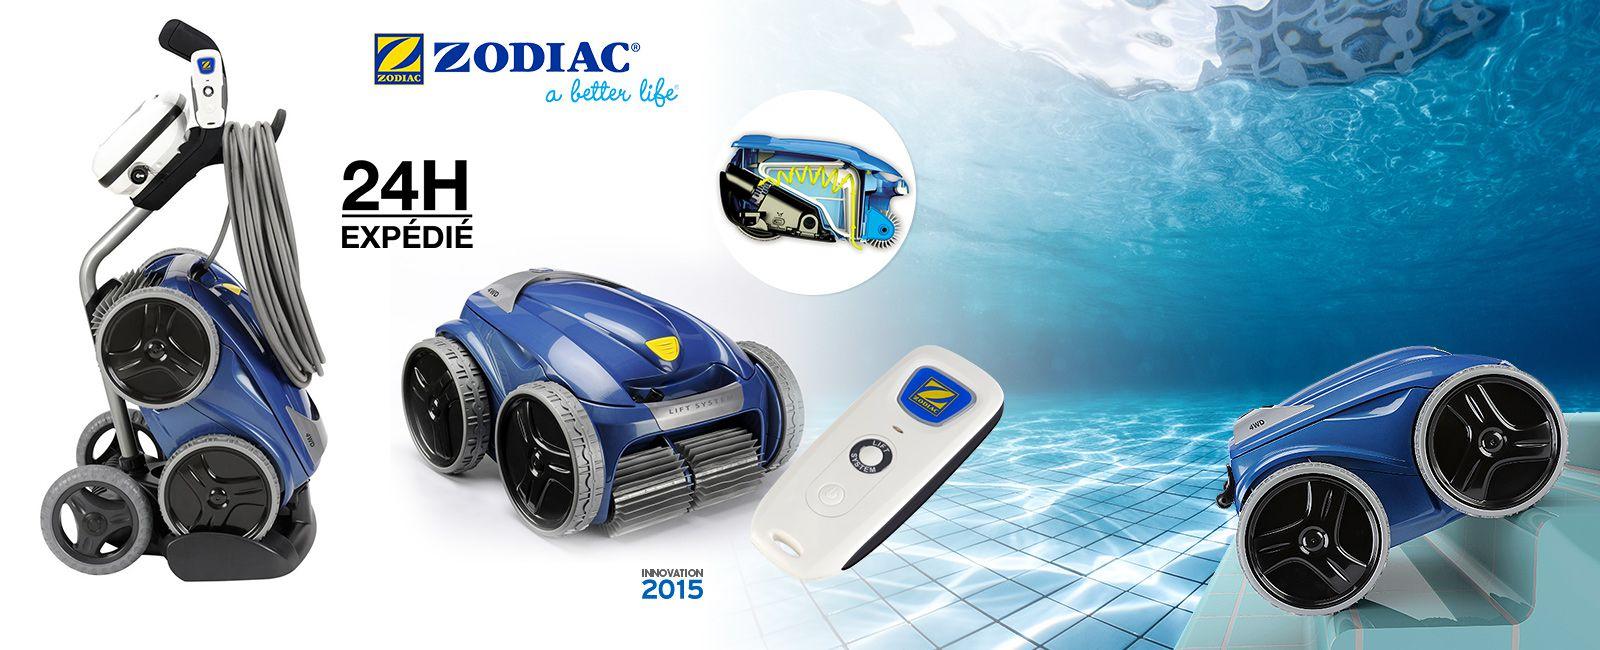 robot piscine zodiac rv 5500